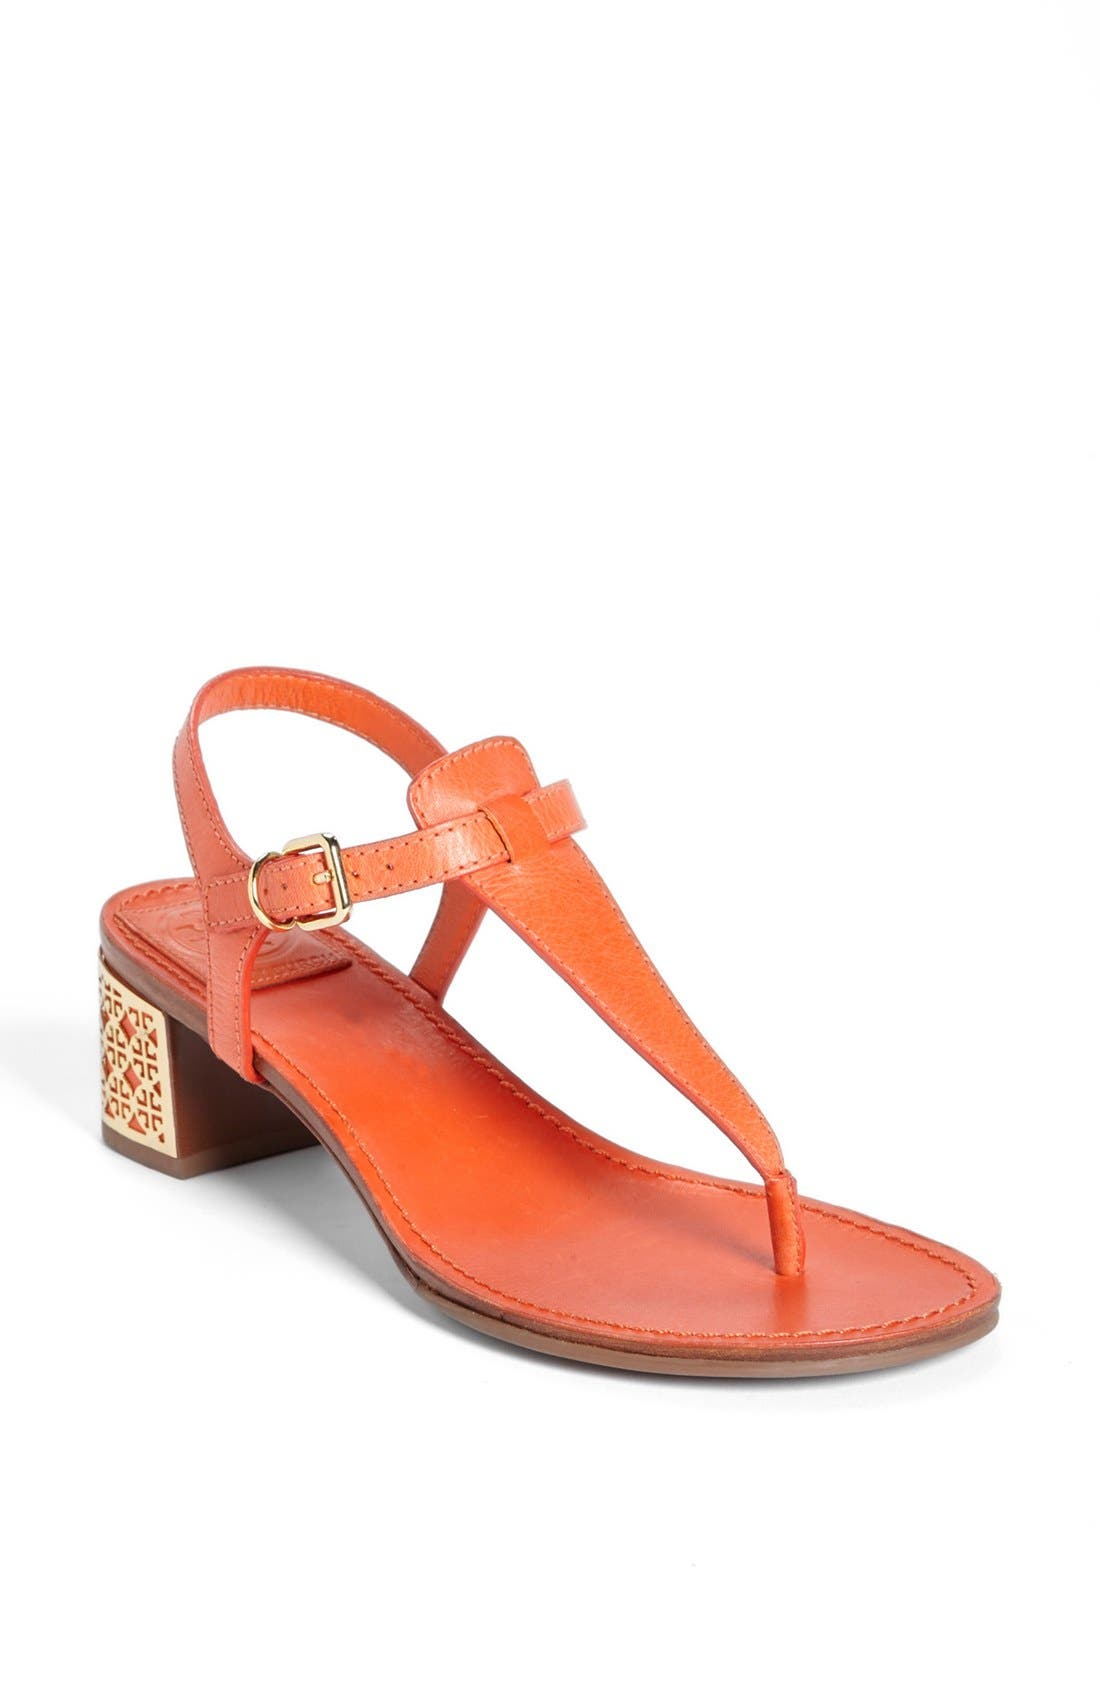 Main Image - Tory Burch 'Audra' Sandal